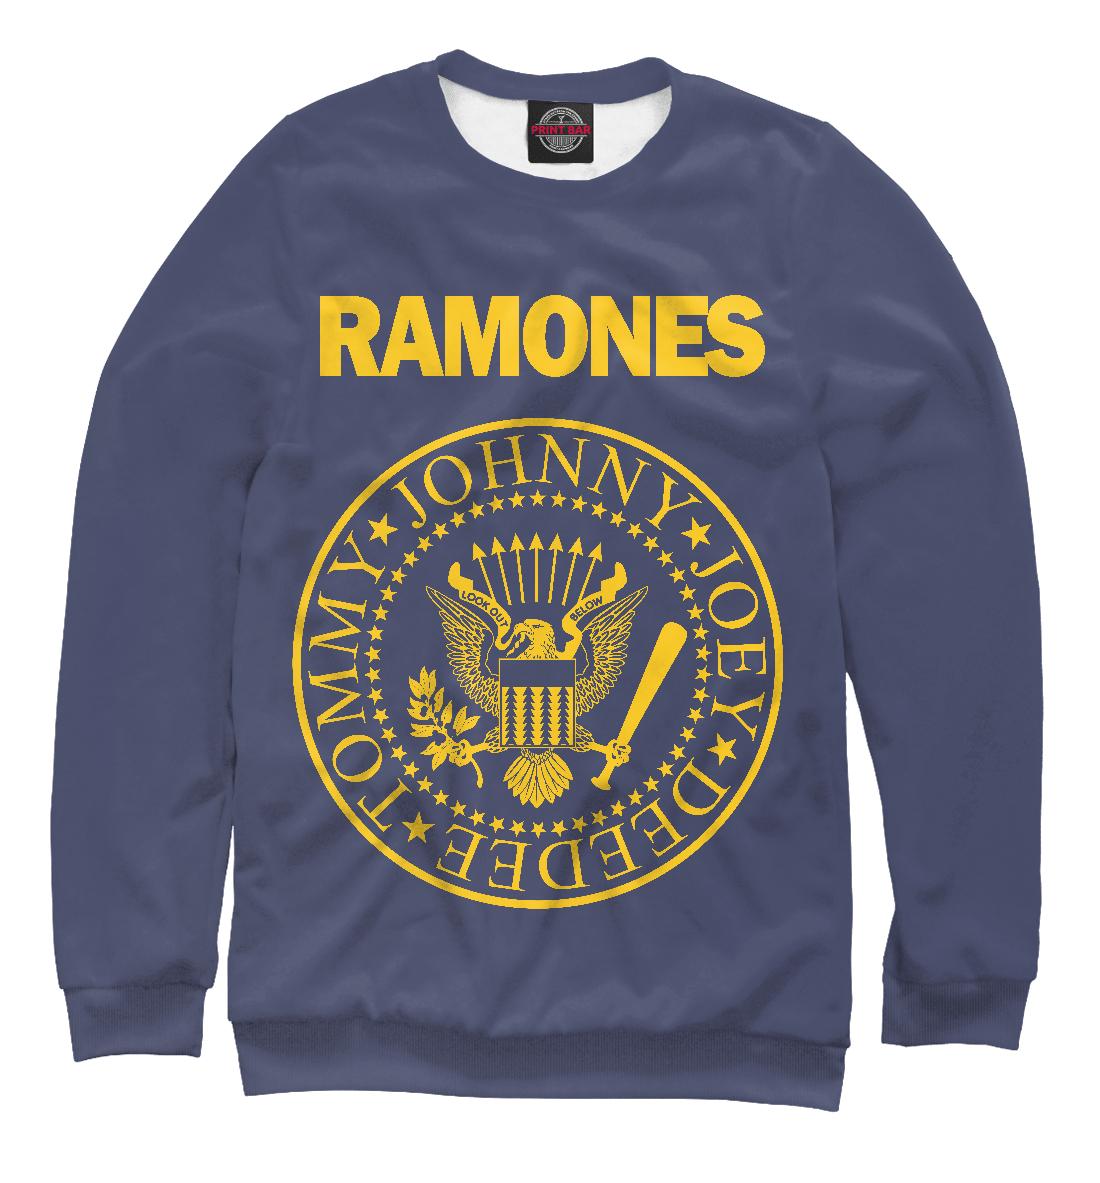 Купить Ramones, Printbar, Свитшоты, RMN-303571-swi-1